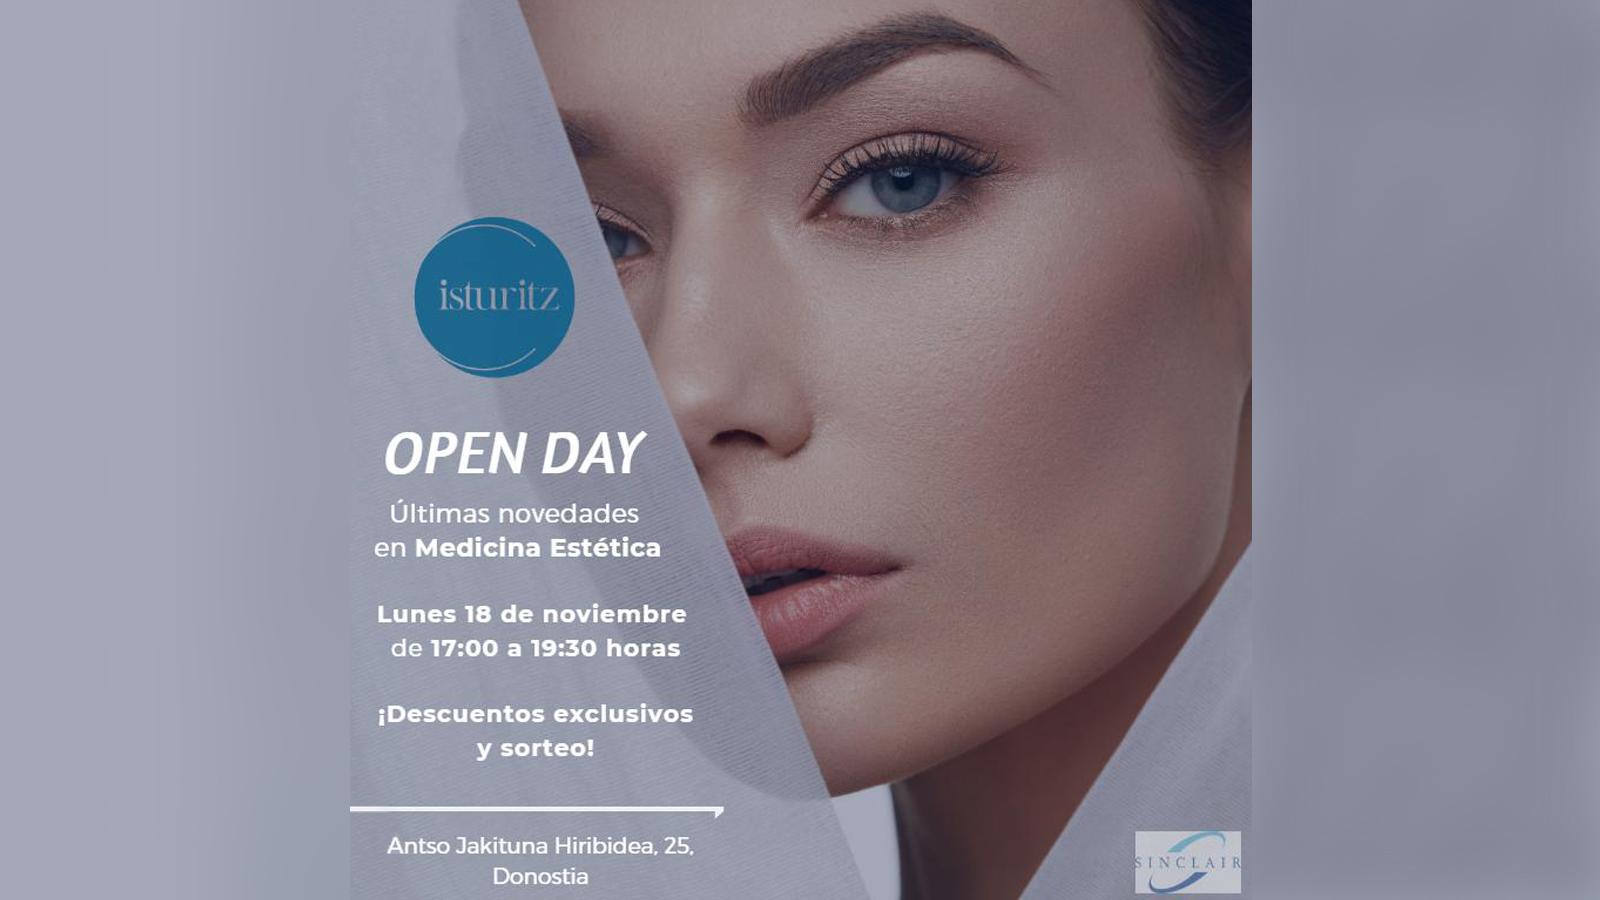 OpenDay clínica Isturitz novedades Medicina Estética noviembre 2019 Donostia San Sebtastián